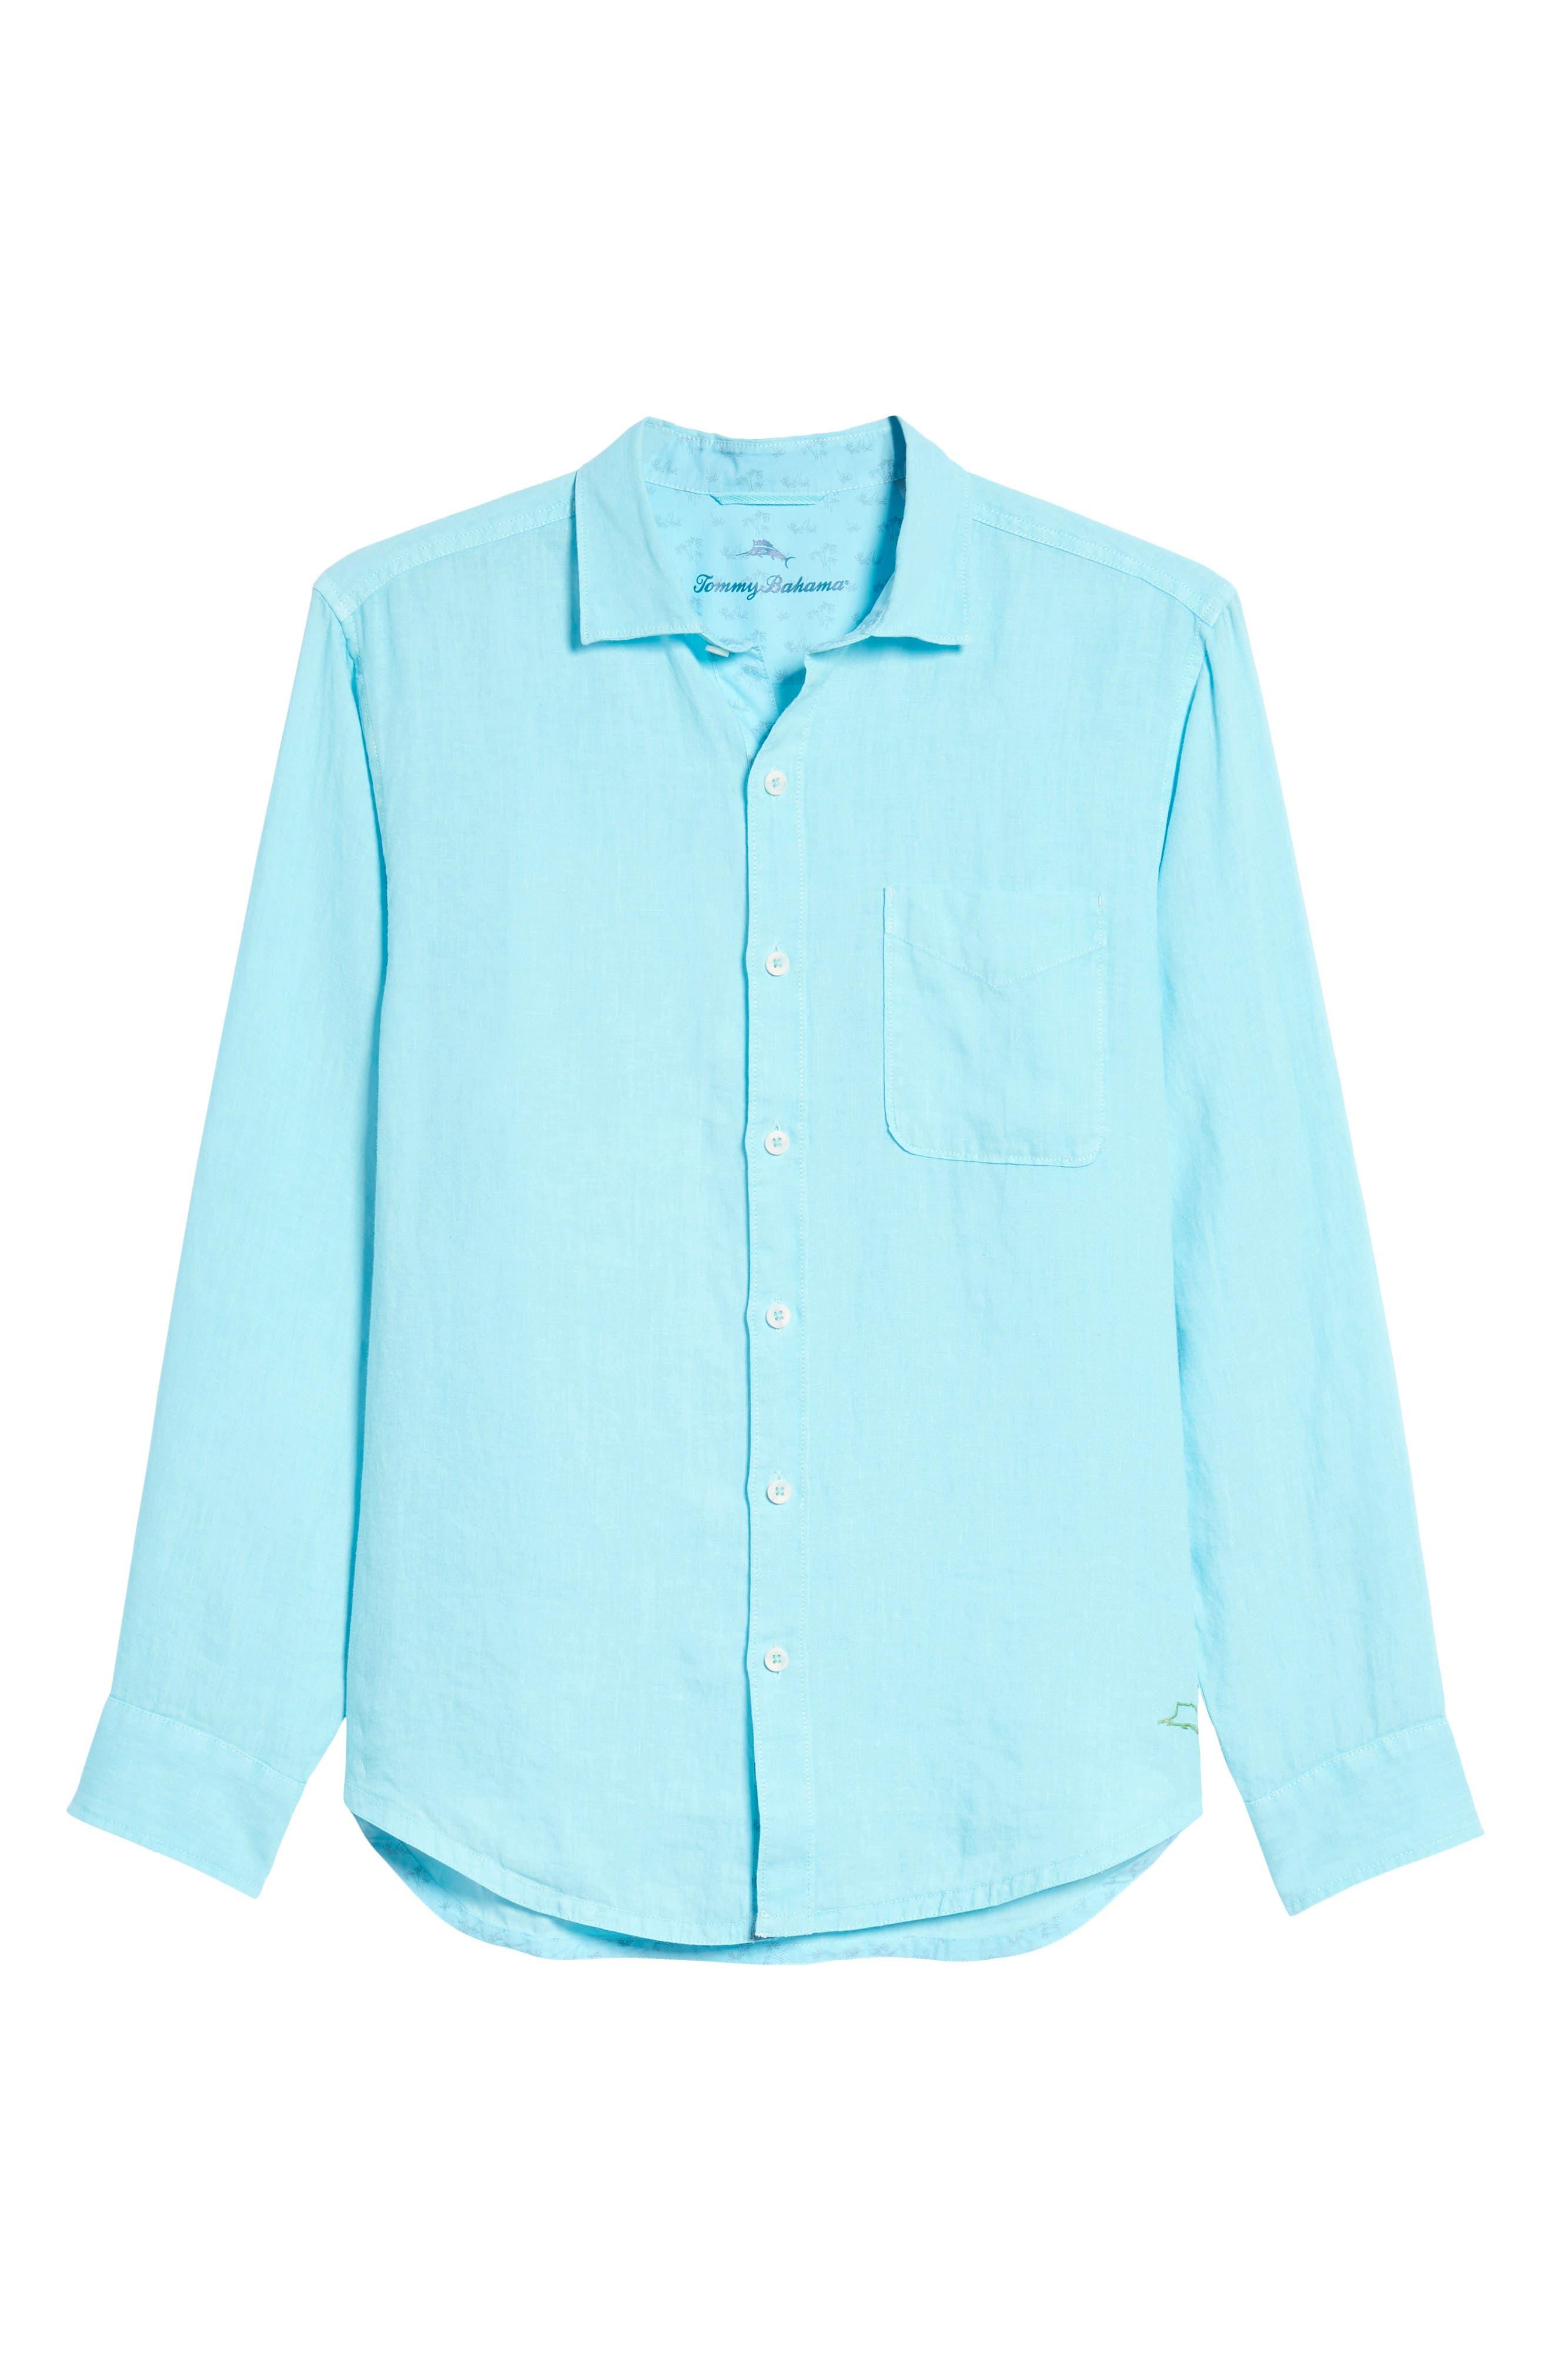 Seaspray Breezer Linen Shirt,                             Alternate thumbnail 24, color,